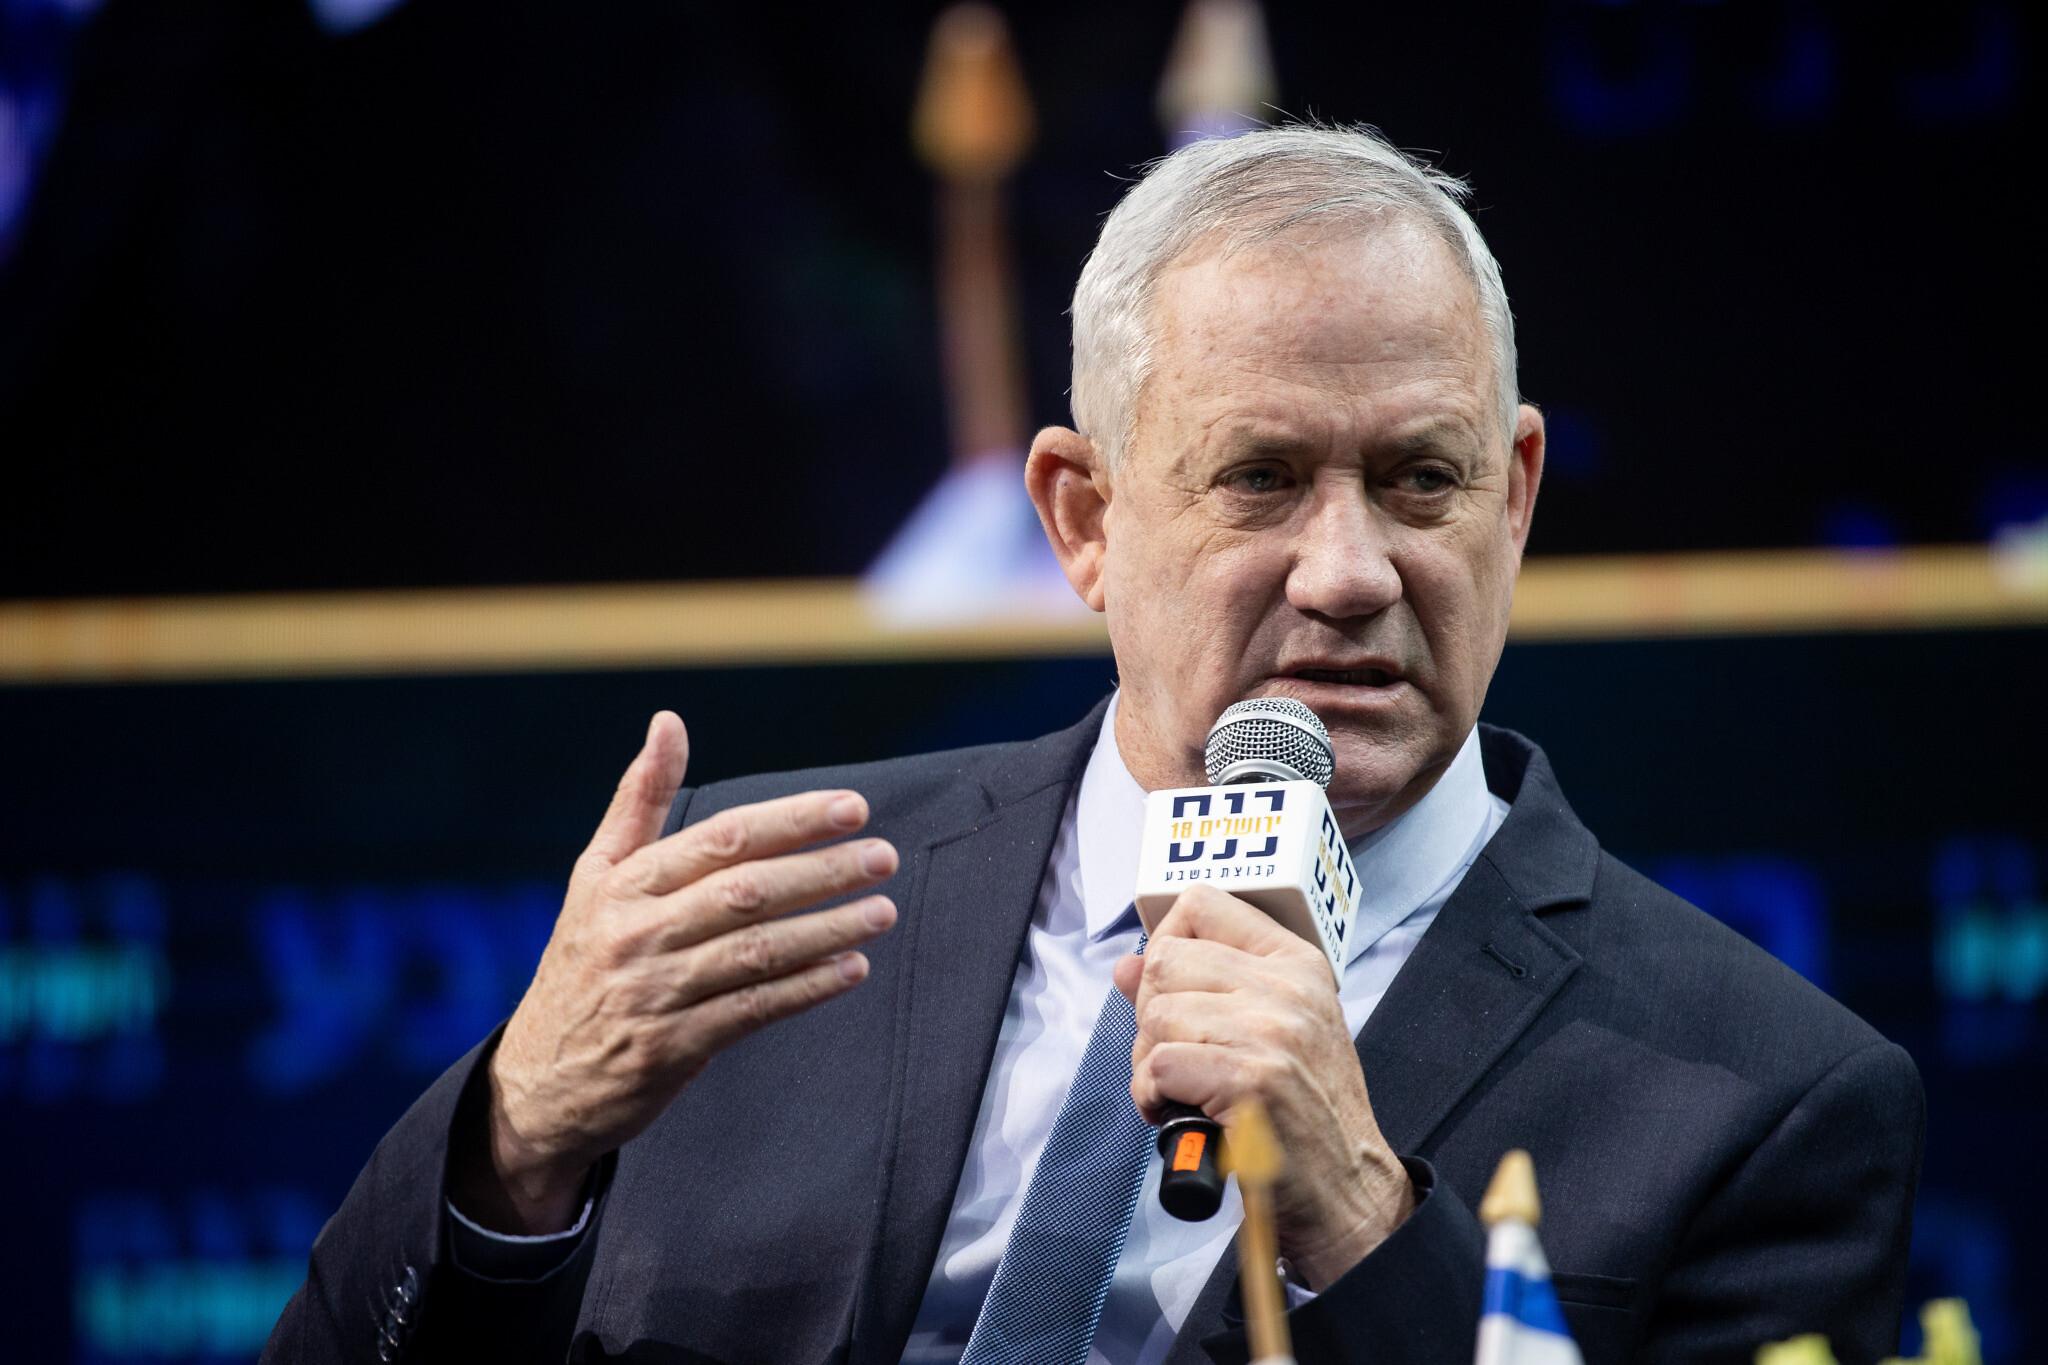 Defense Minister Benny Gantz speaks at the annual Jerusalem Conference of the 'Besheva' group in Jerusalem